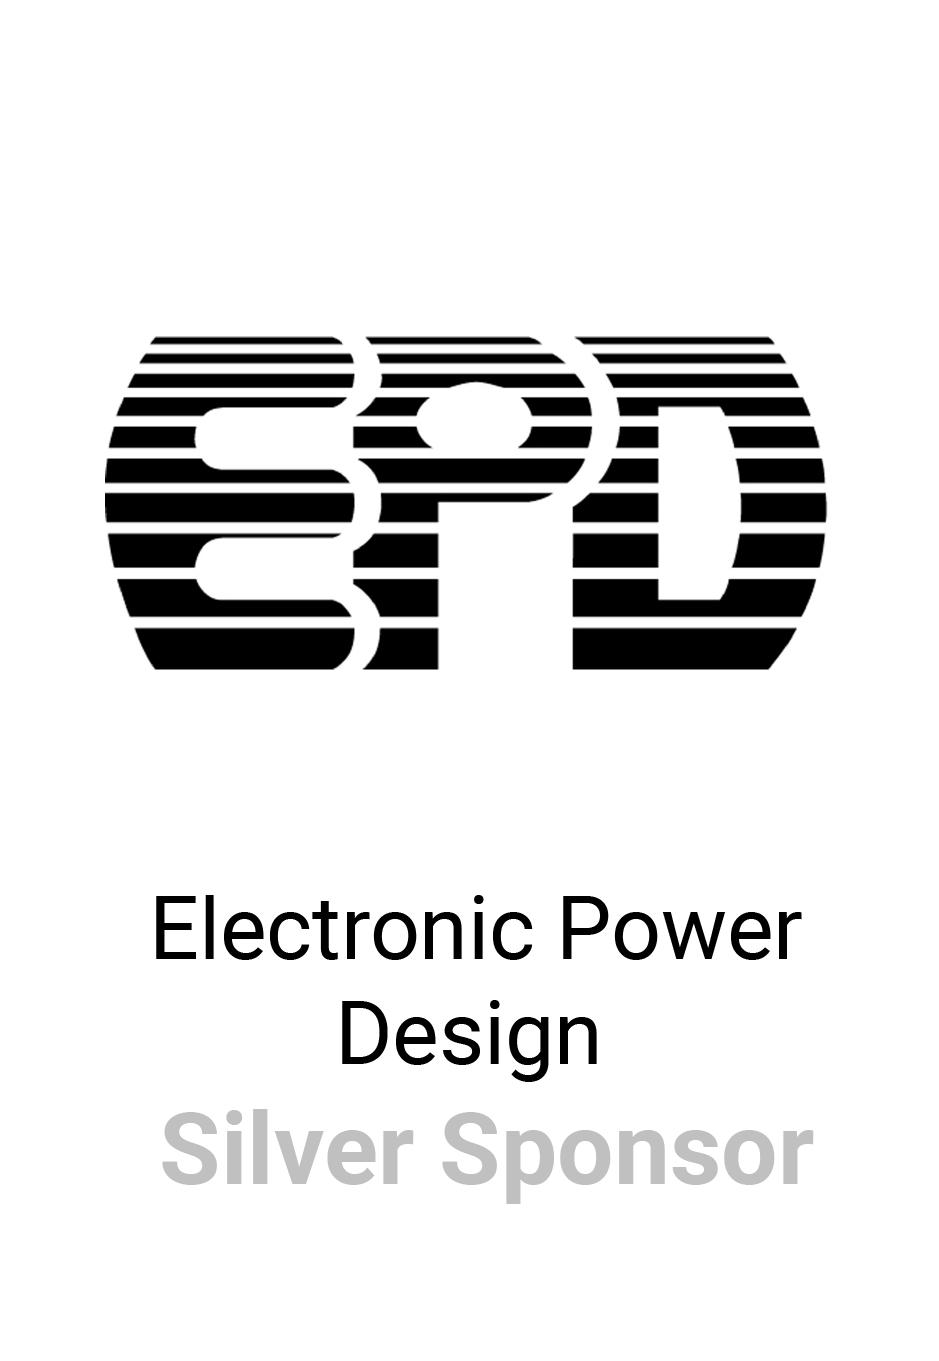 Electronic Power Design